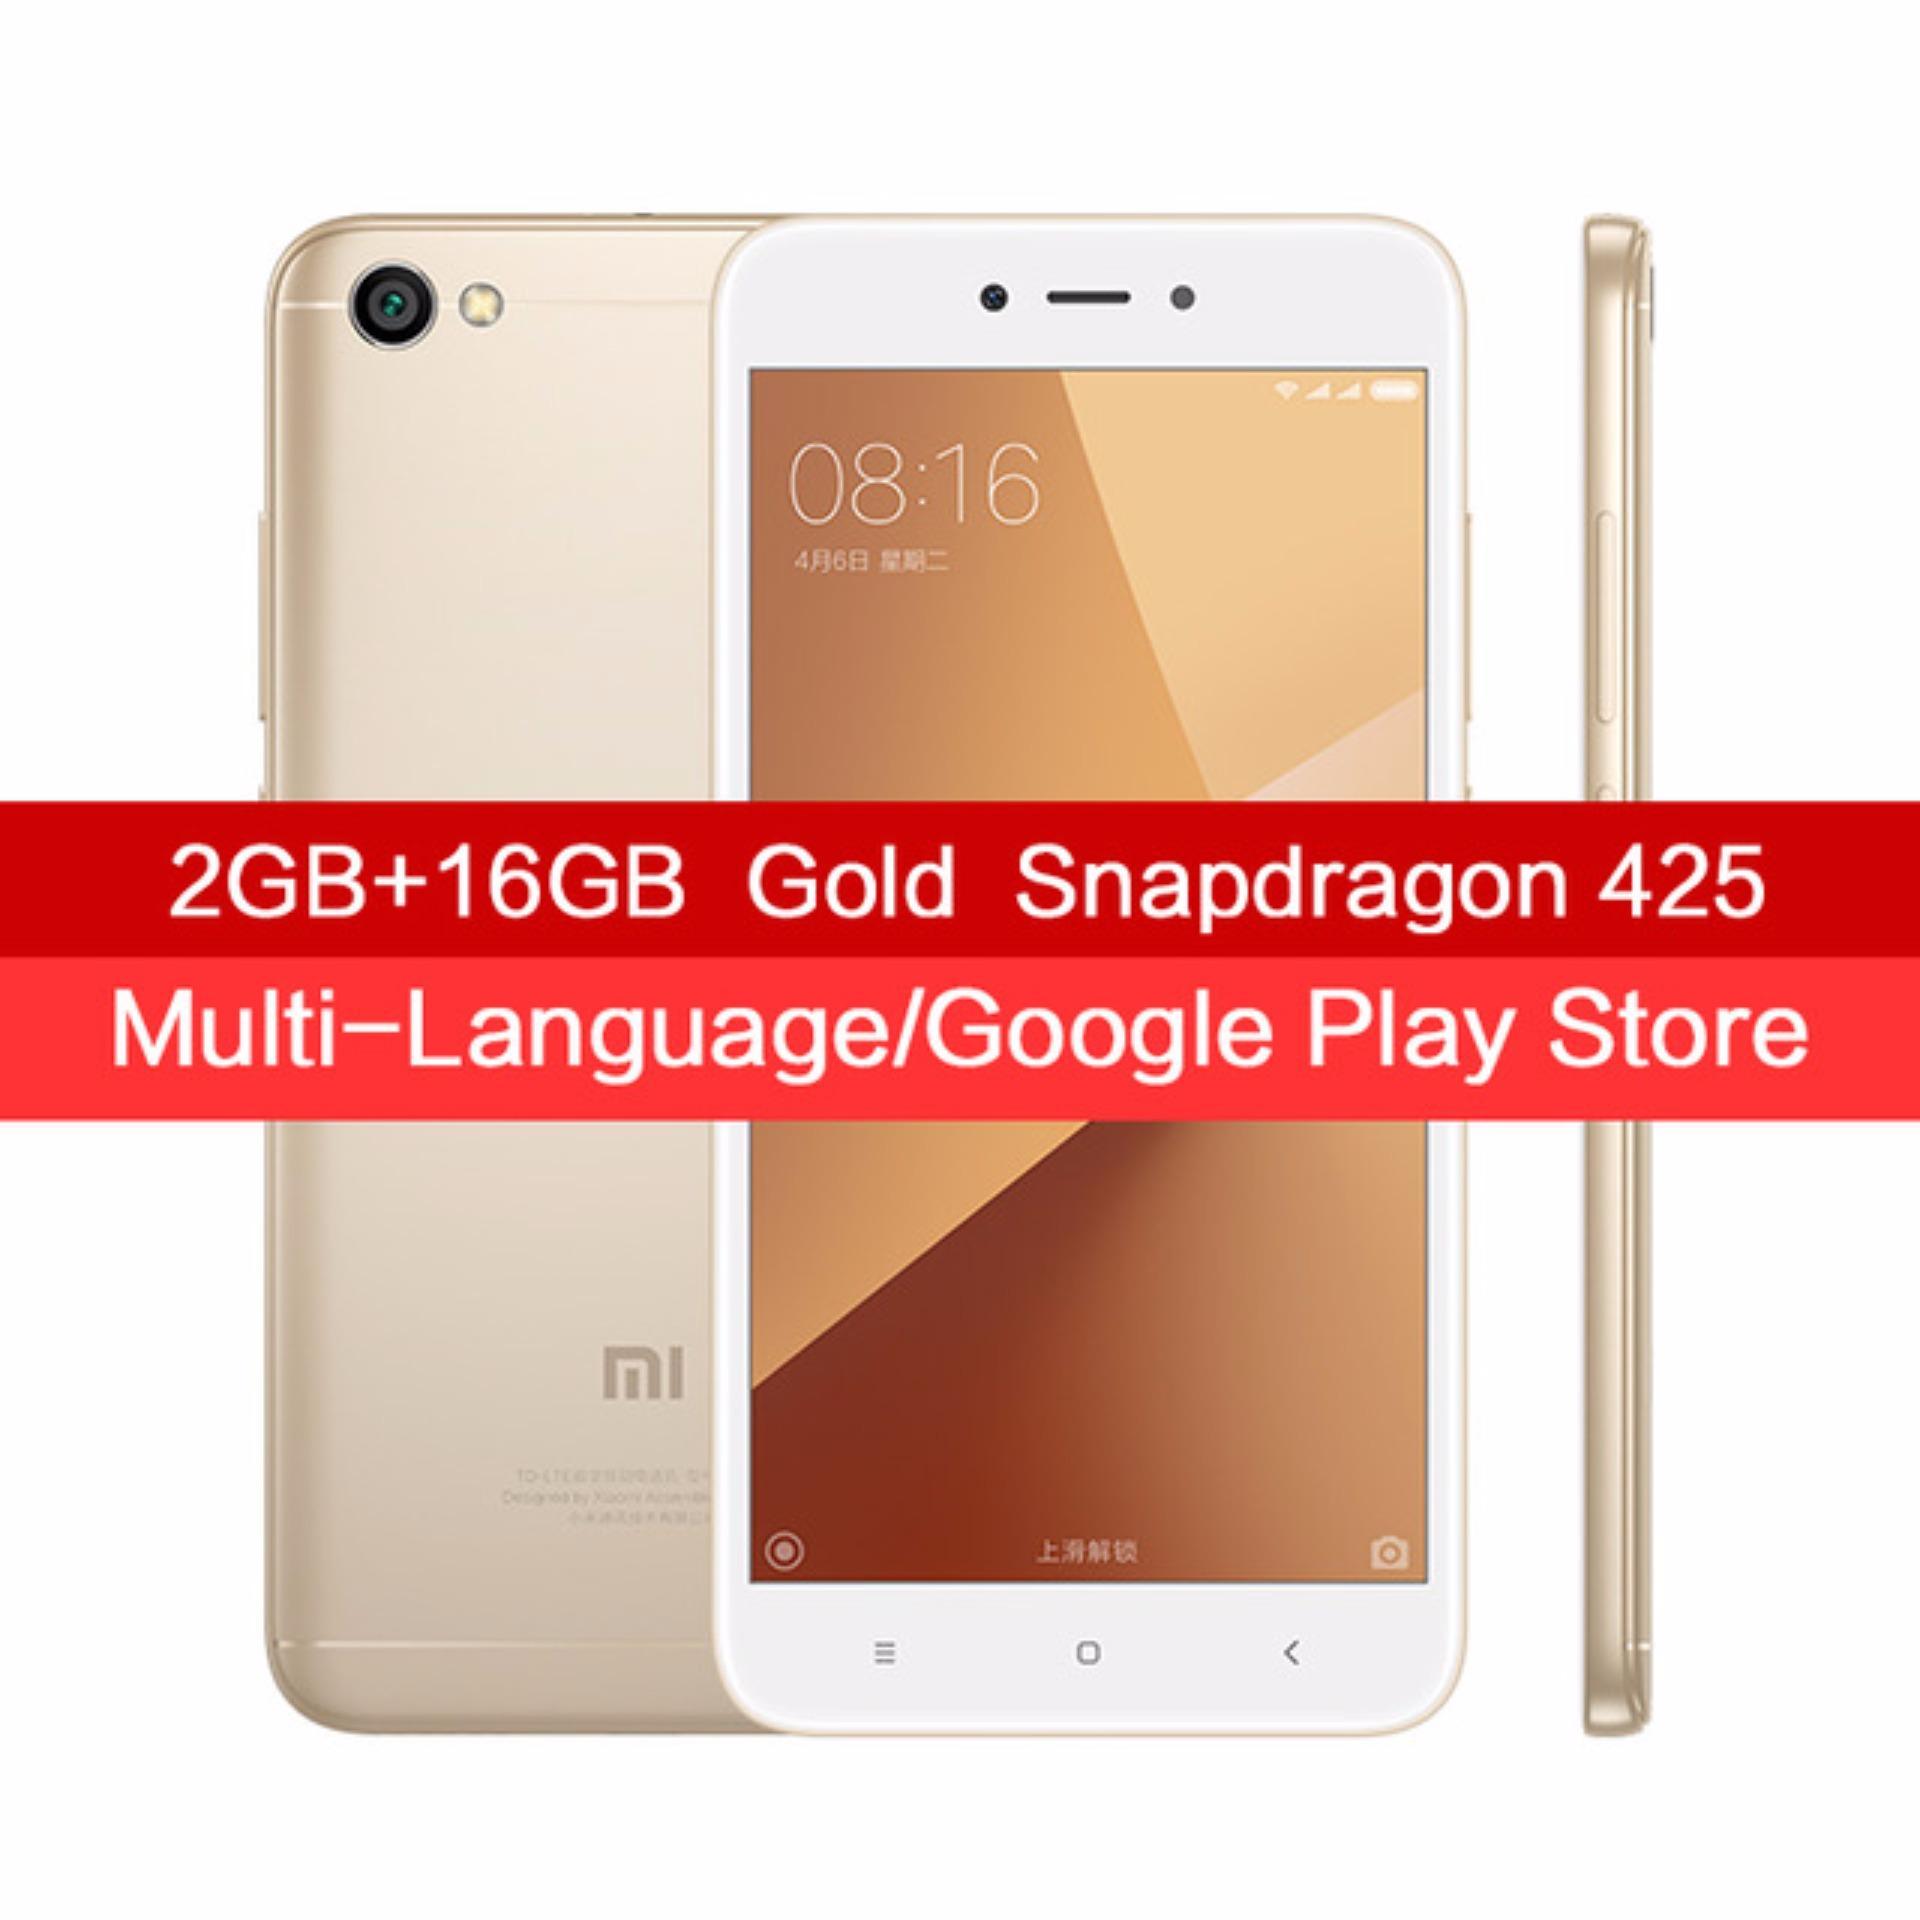 Philippines Xiaomi Redmi Note 5a 2gb Ram 16gb Rom Find Best Deals 3s Gold